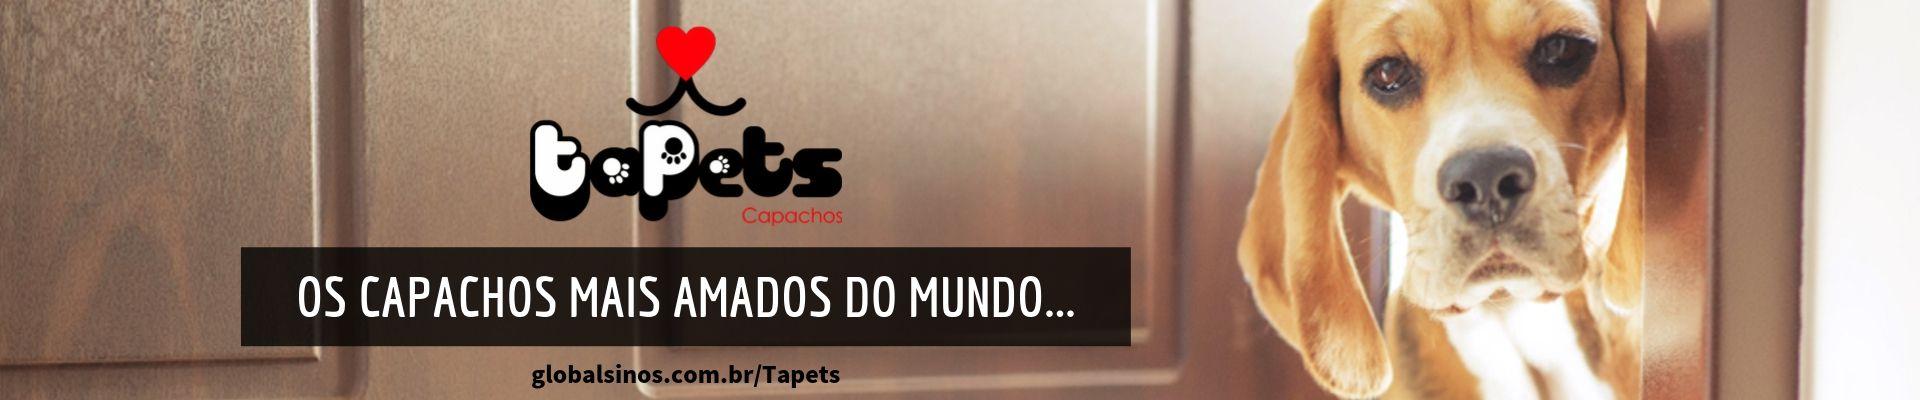 Tapets